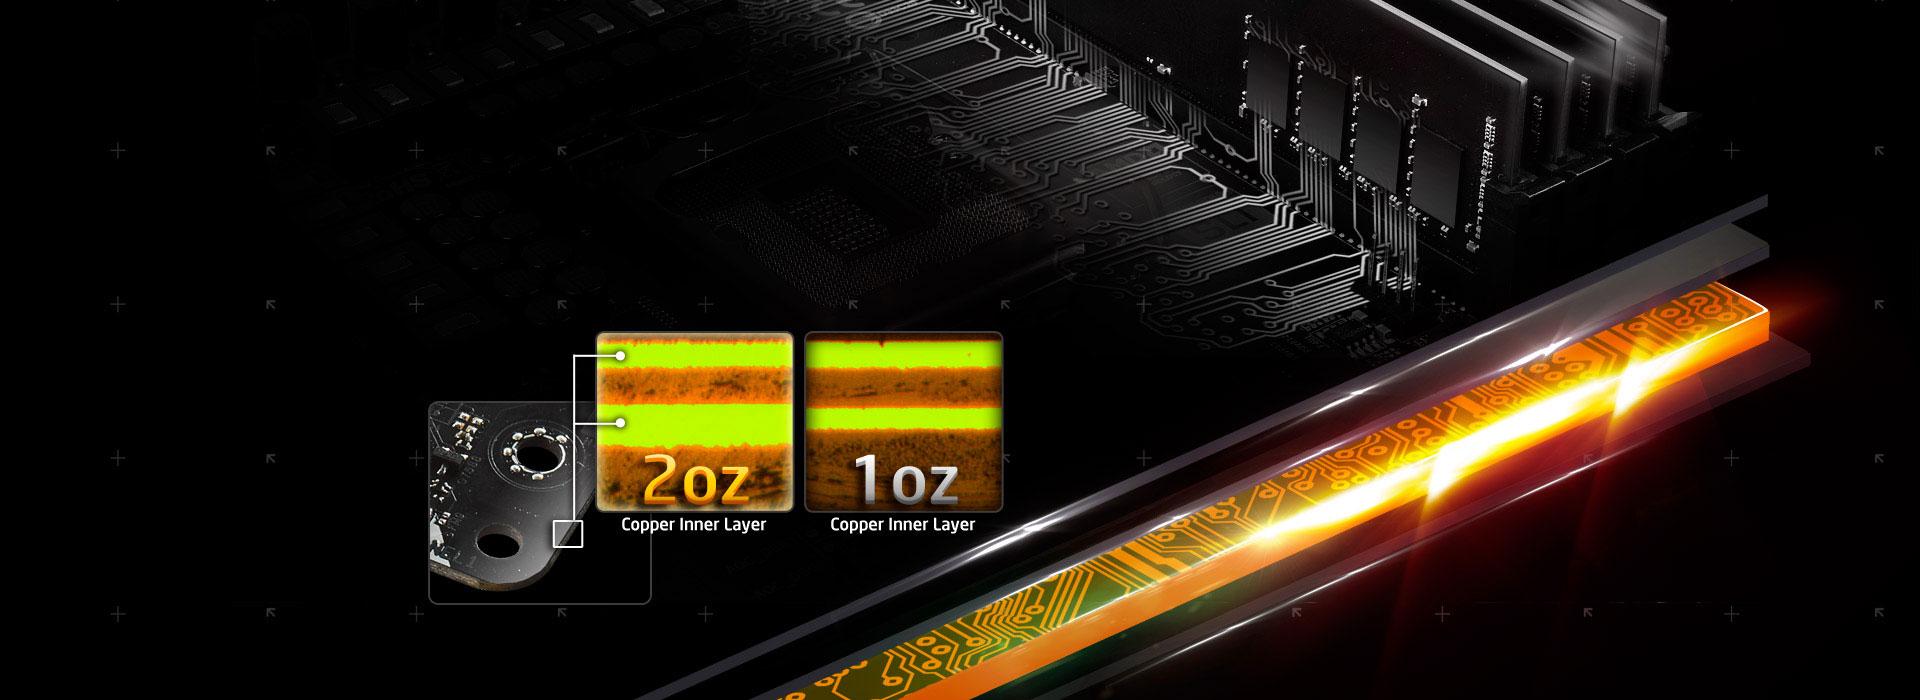 ASRock B450 PRO4 AM4 AMD Promontory B450 SATA 6Gb/s USB 3 1 HDMI ATX AMD  motherboard - Newegg com